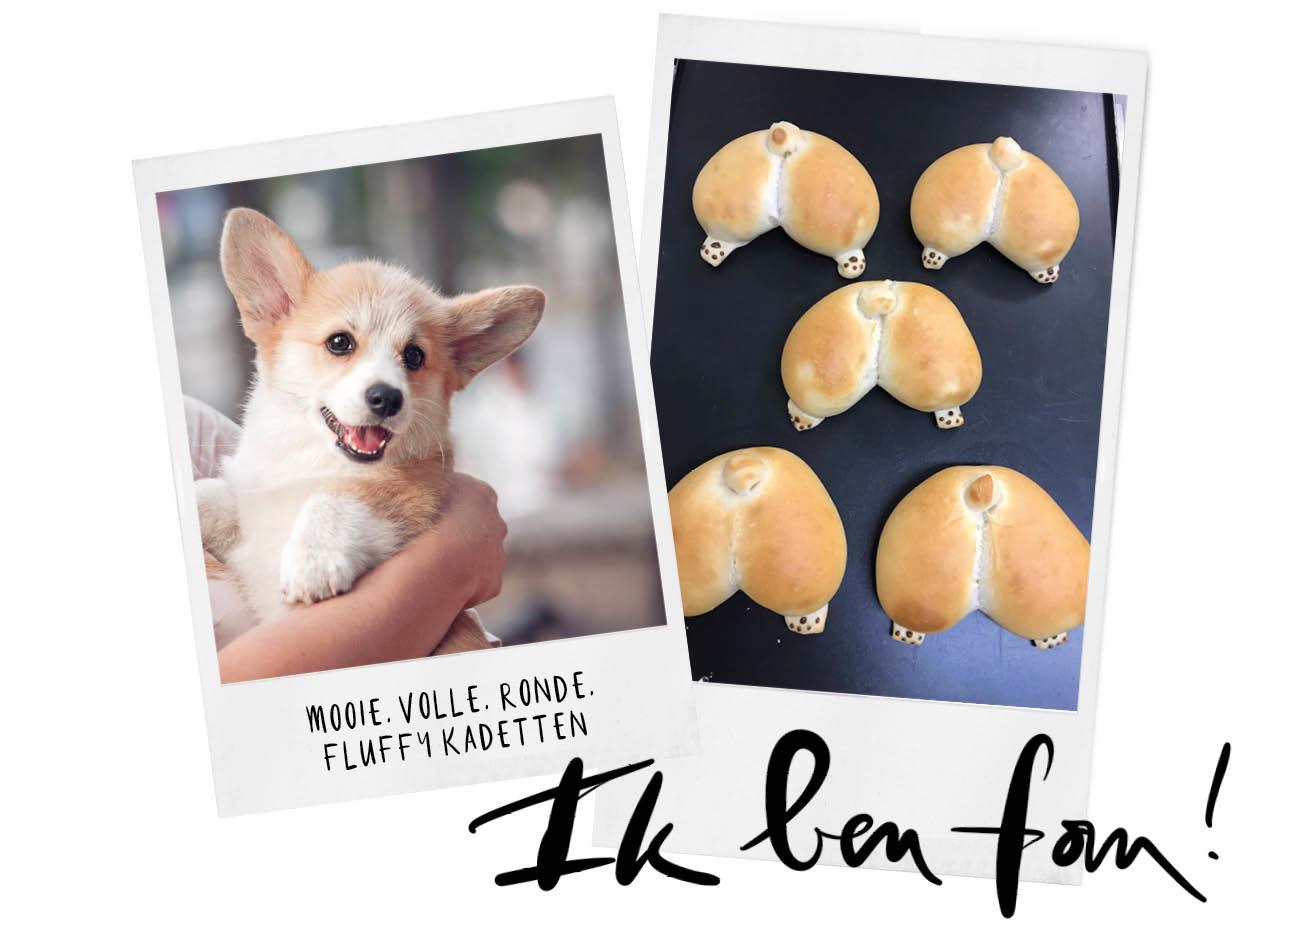 hond in iemand armen kontjes koekjes